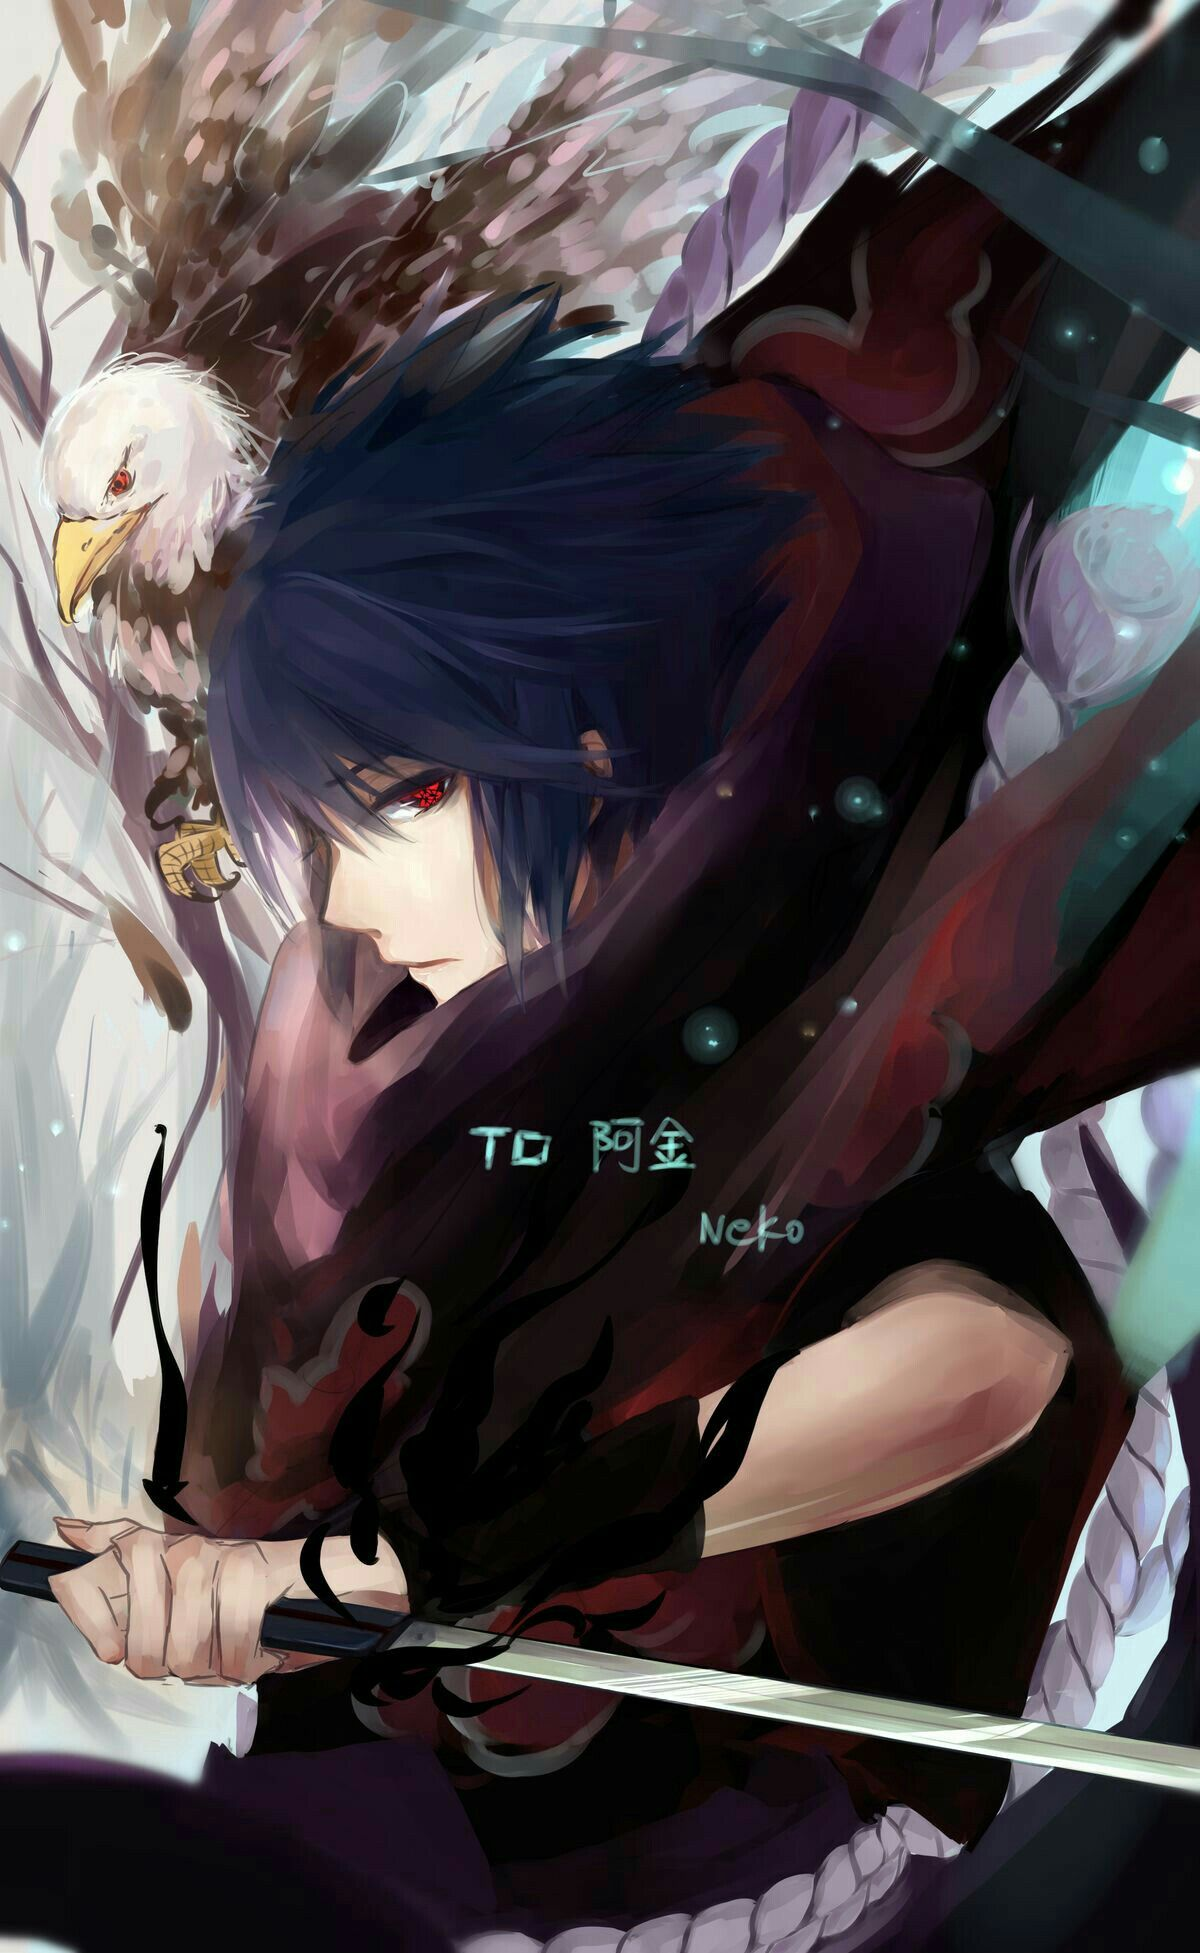 Gambar Uchiha Sasuke oleh Sora Ouji Animasi, Seni anime